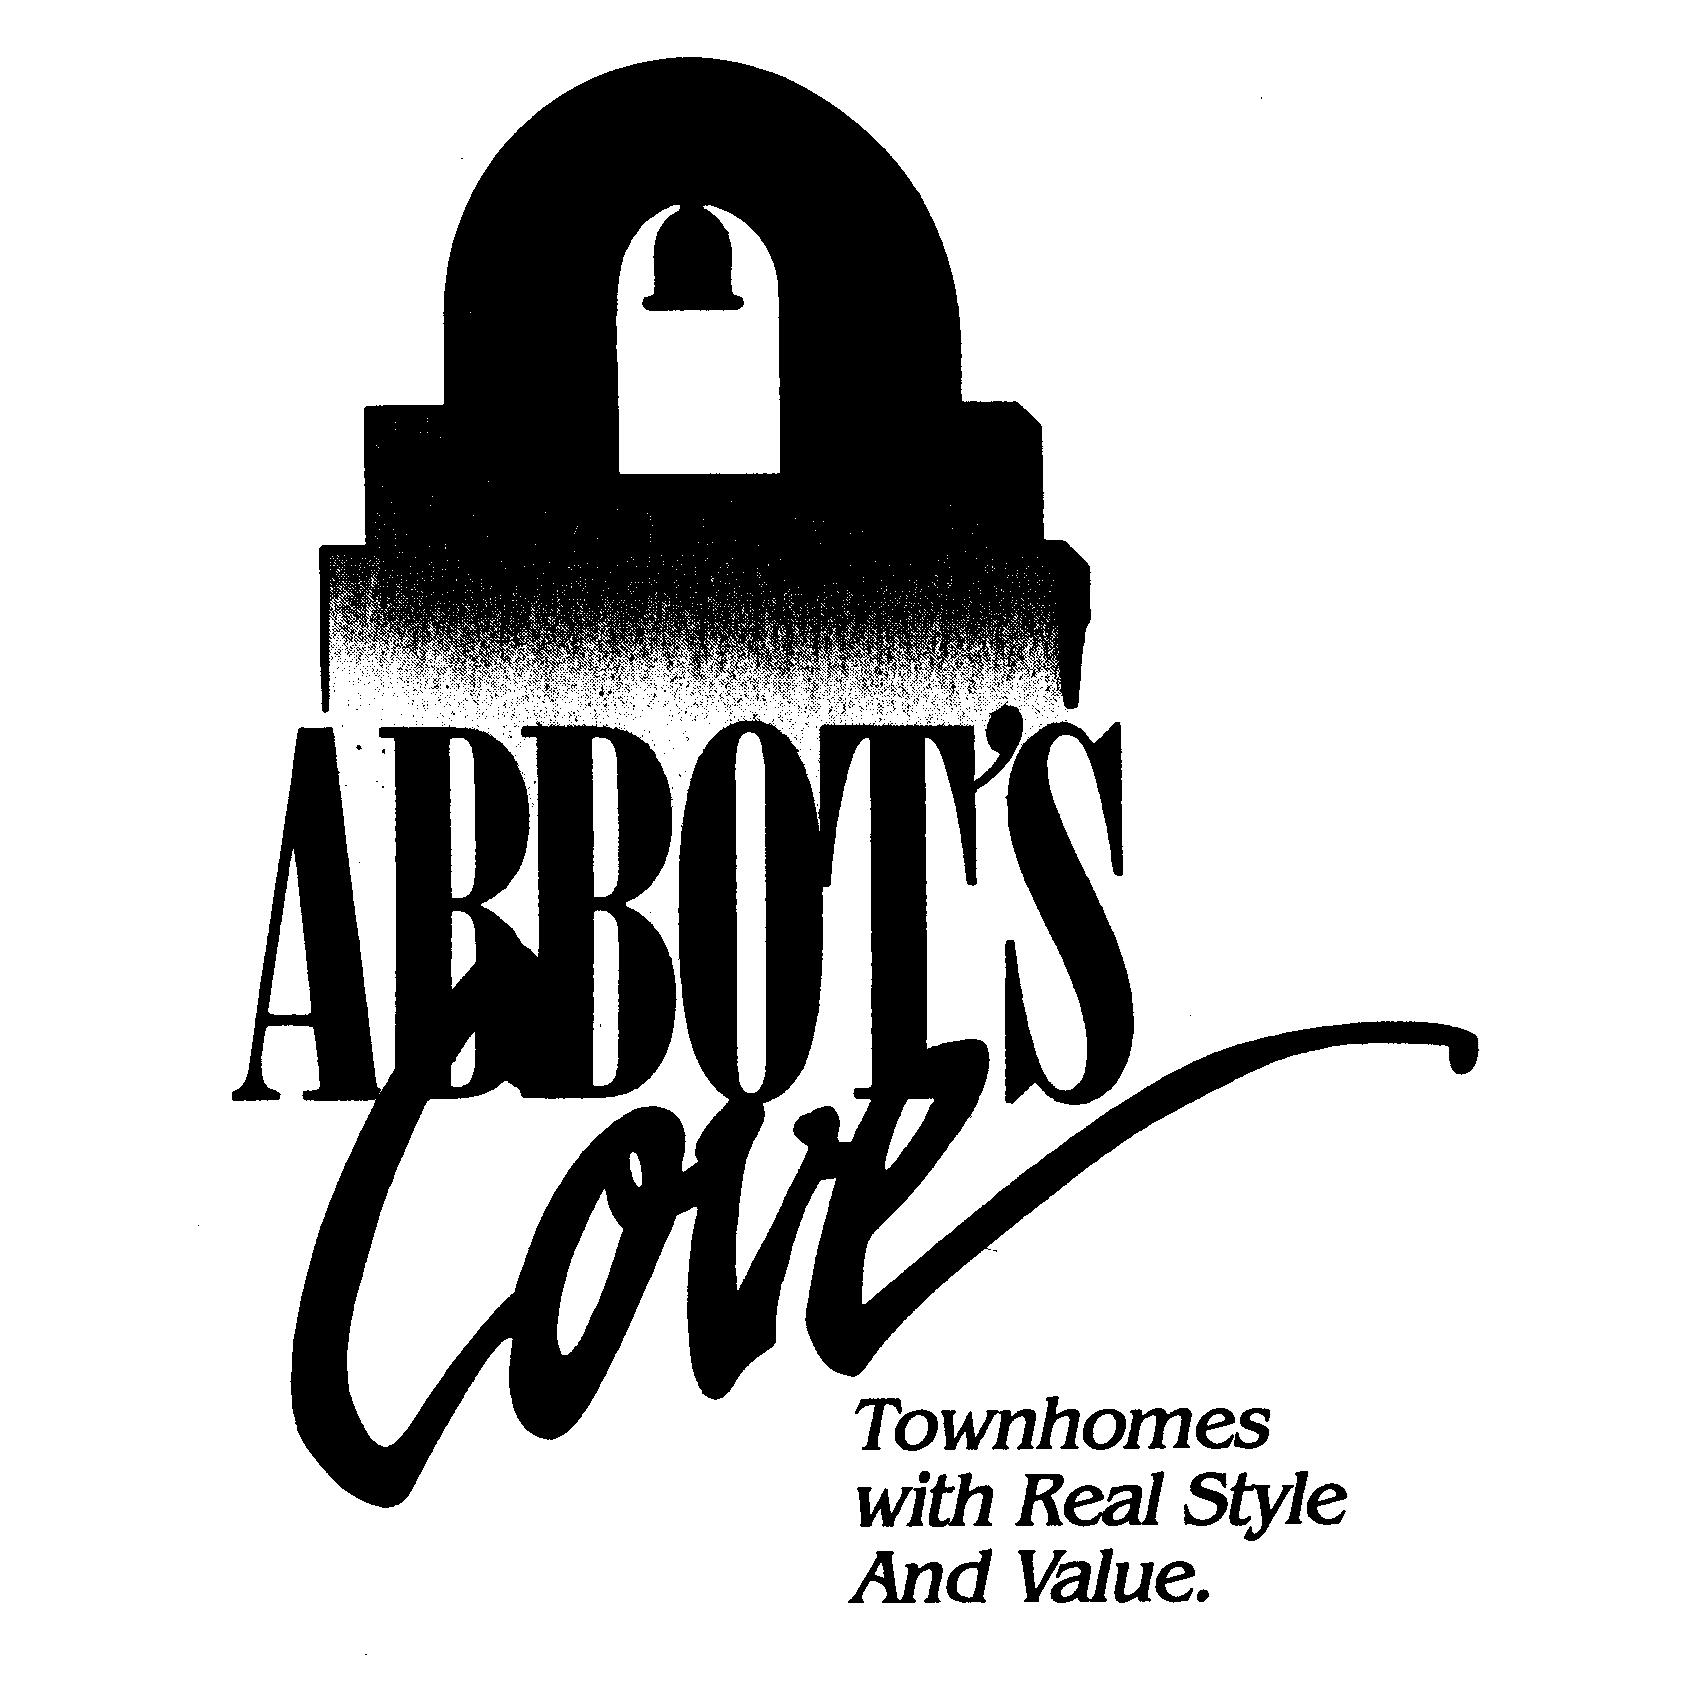 Abbot's Cove